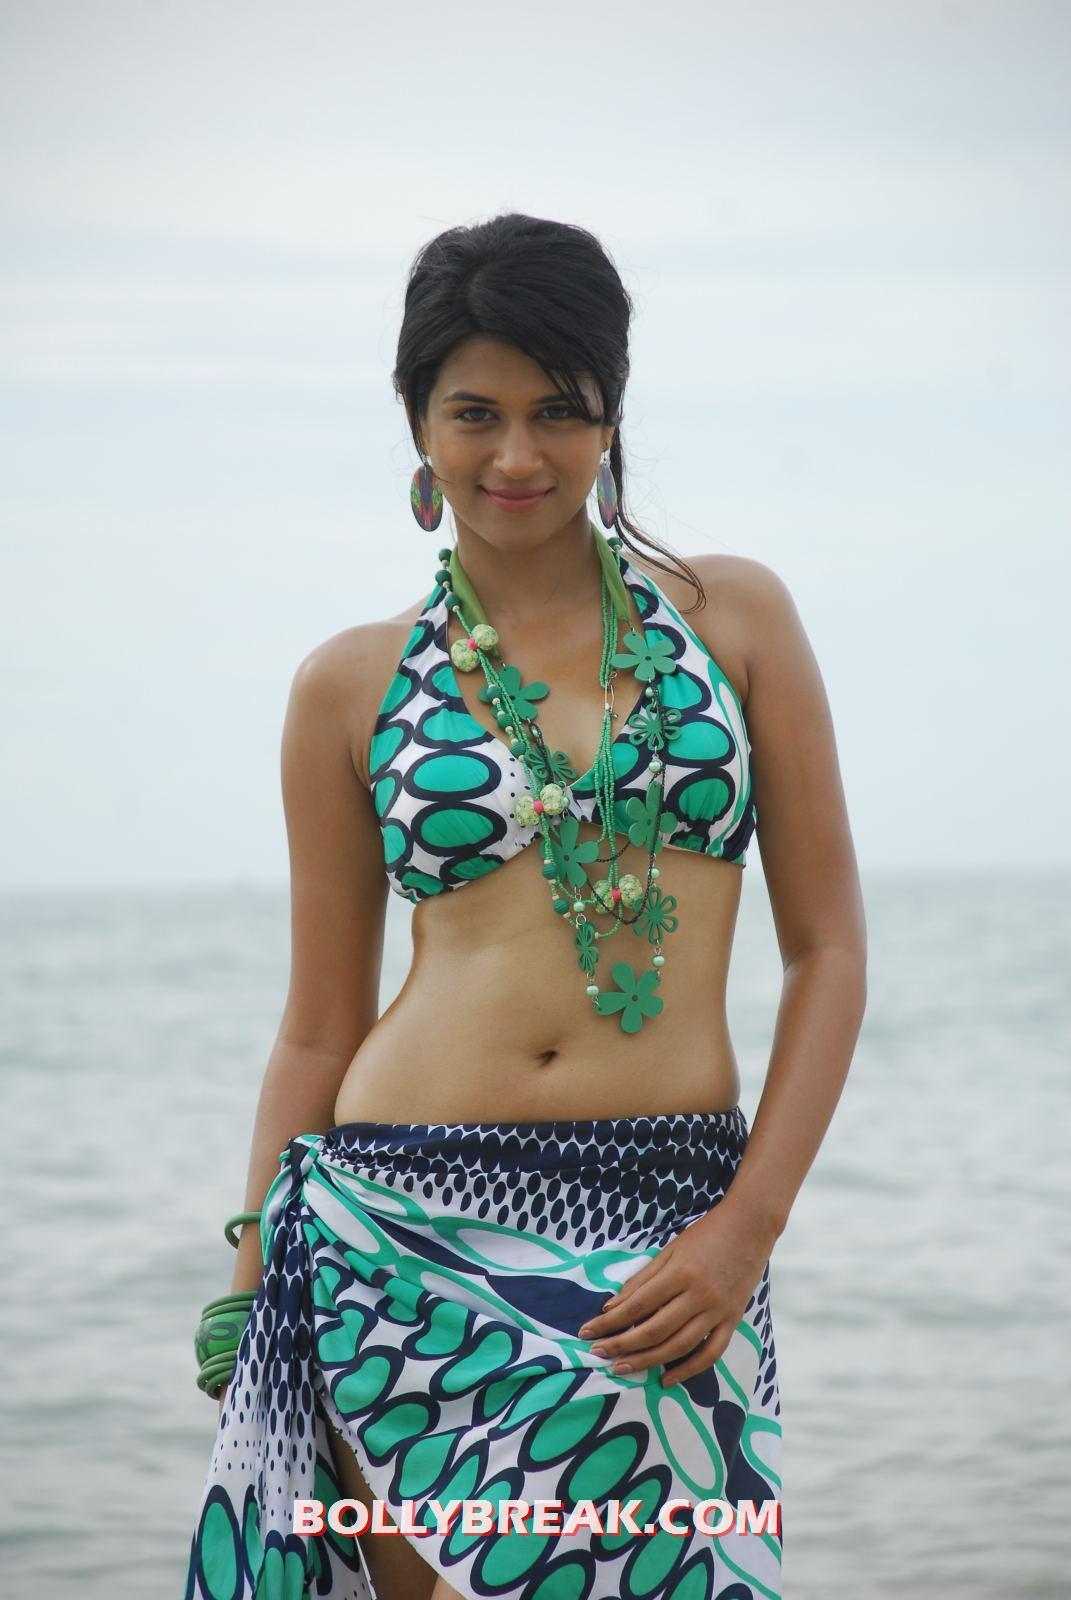 Suggest you Shraddha das hot bikini